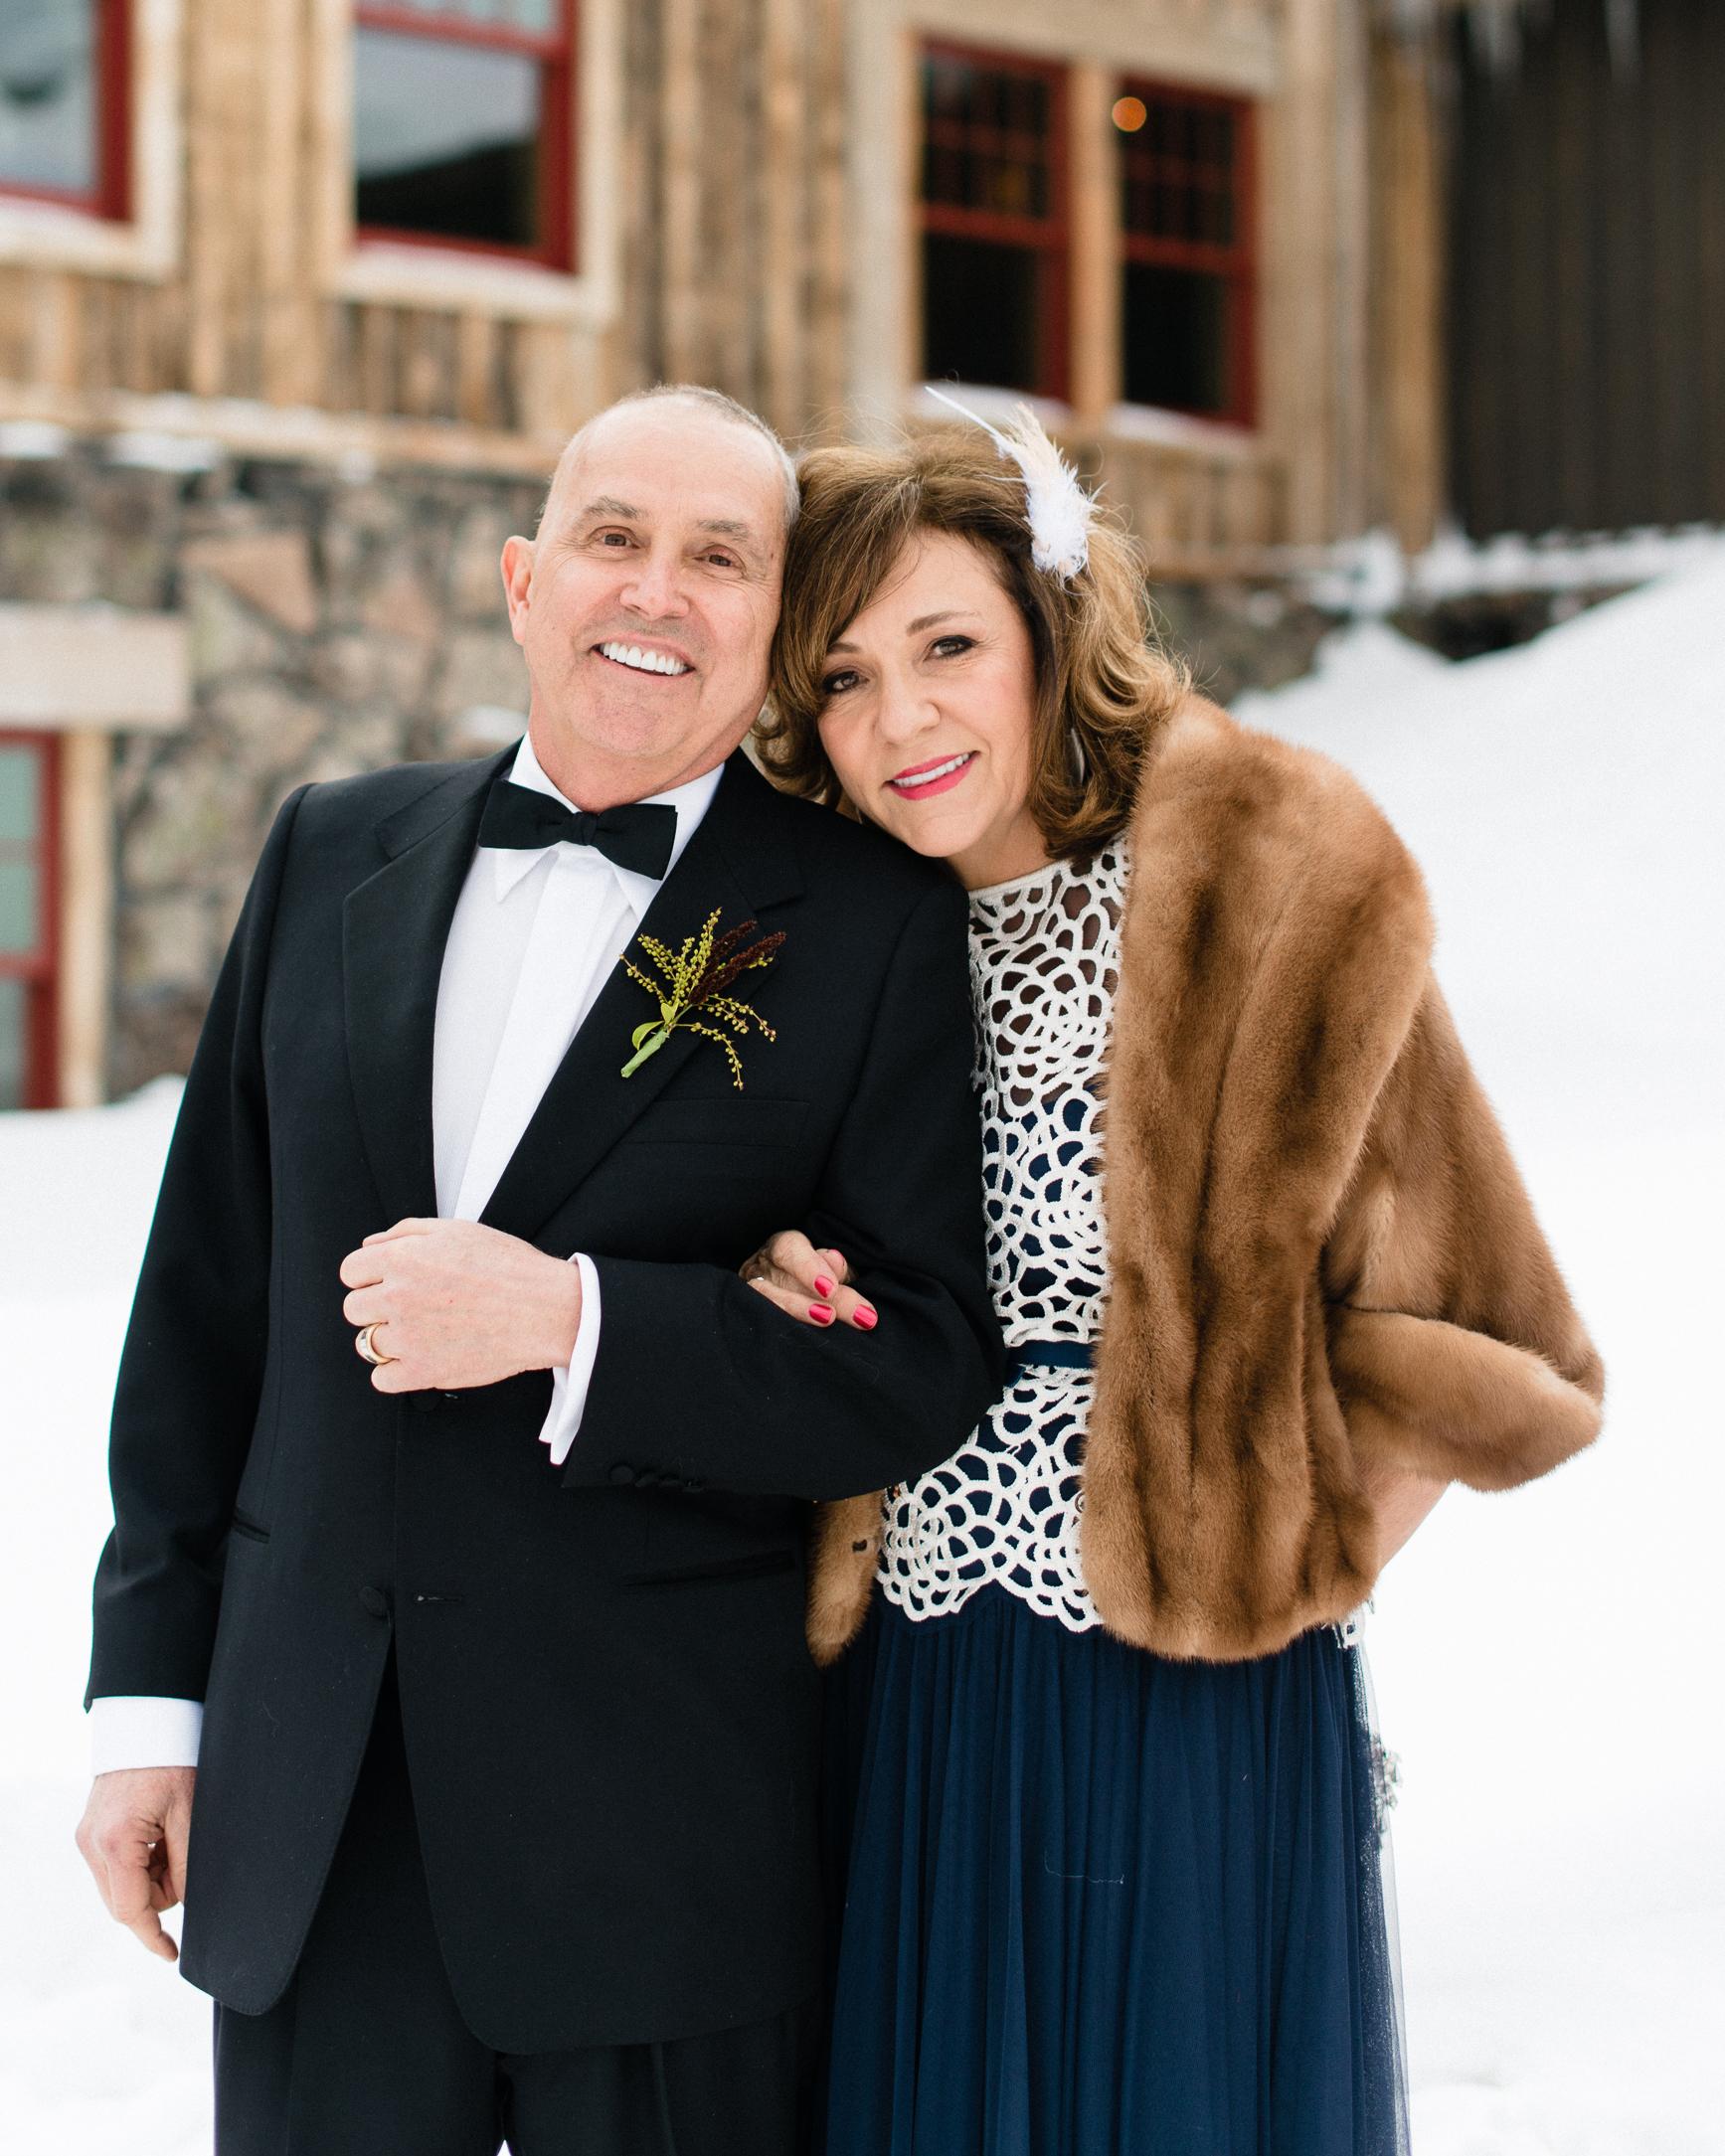 tiffany-nicholas-wedding-parents-092-s111339-0714.jpg